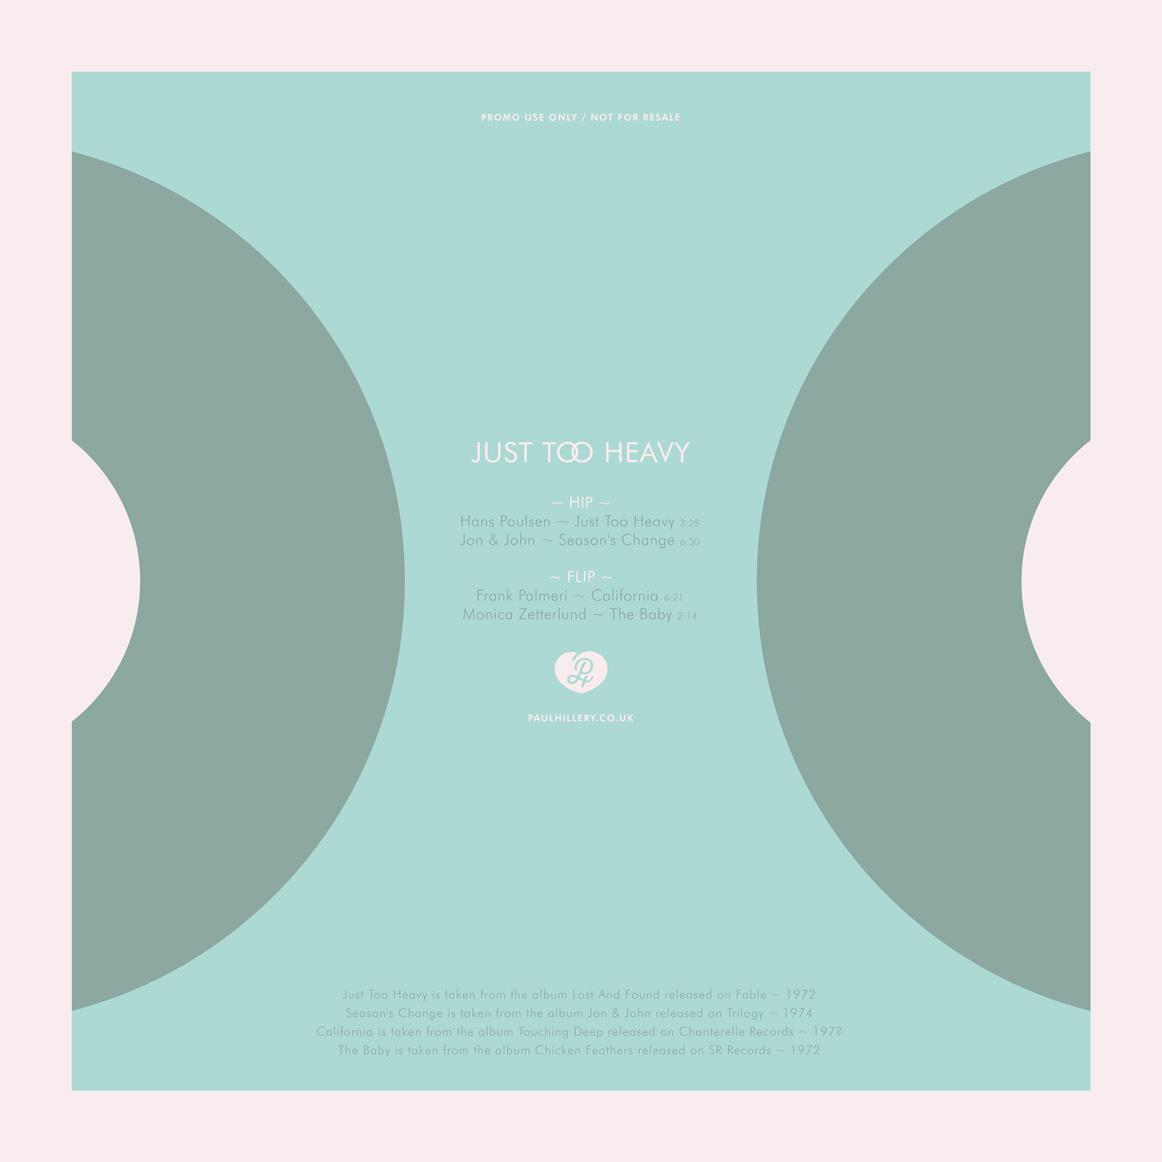 Just Too Heavy vinyl sleeve design by Paul Hillery